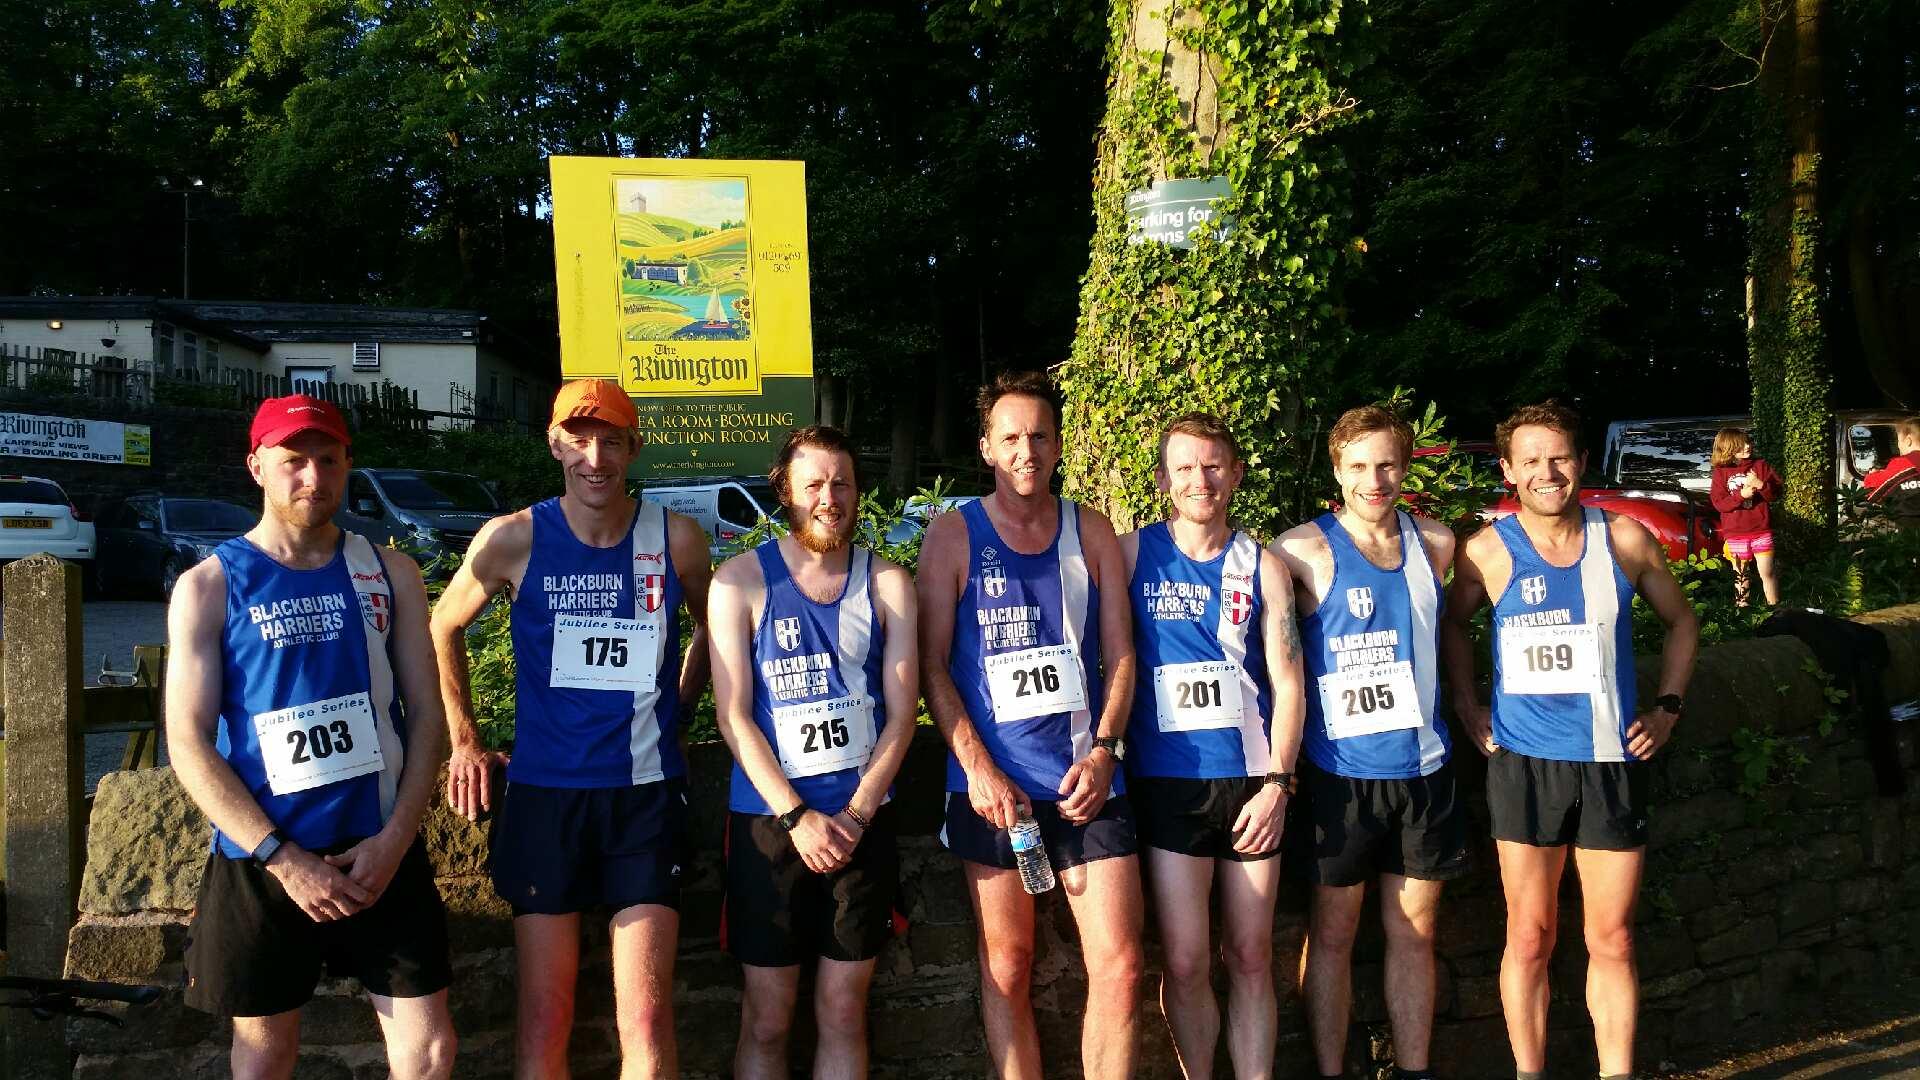 Ben Wins Horwich + Team, Vet  & Junior Wins  – Wholan Nook Fell Race – Hammer PB for Tony